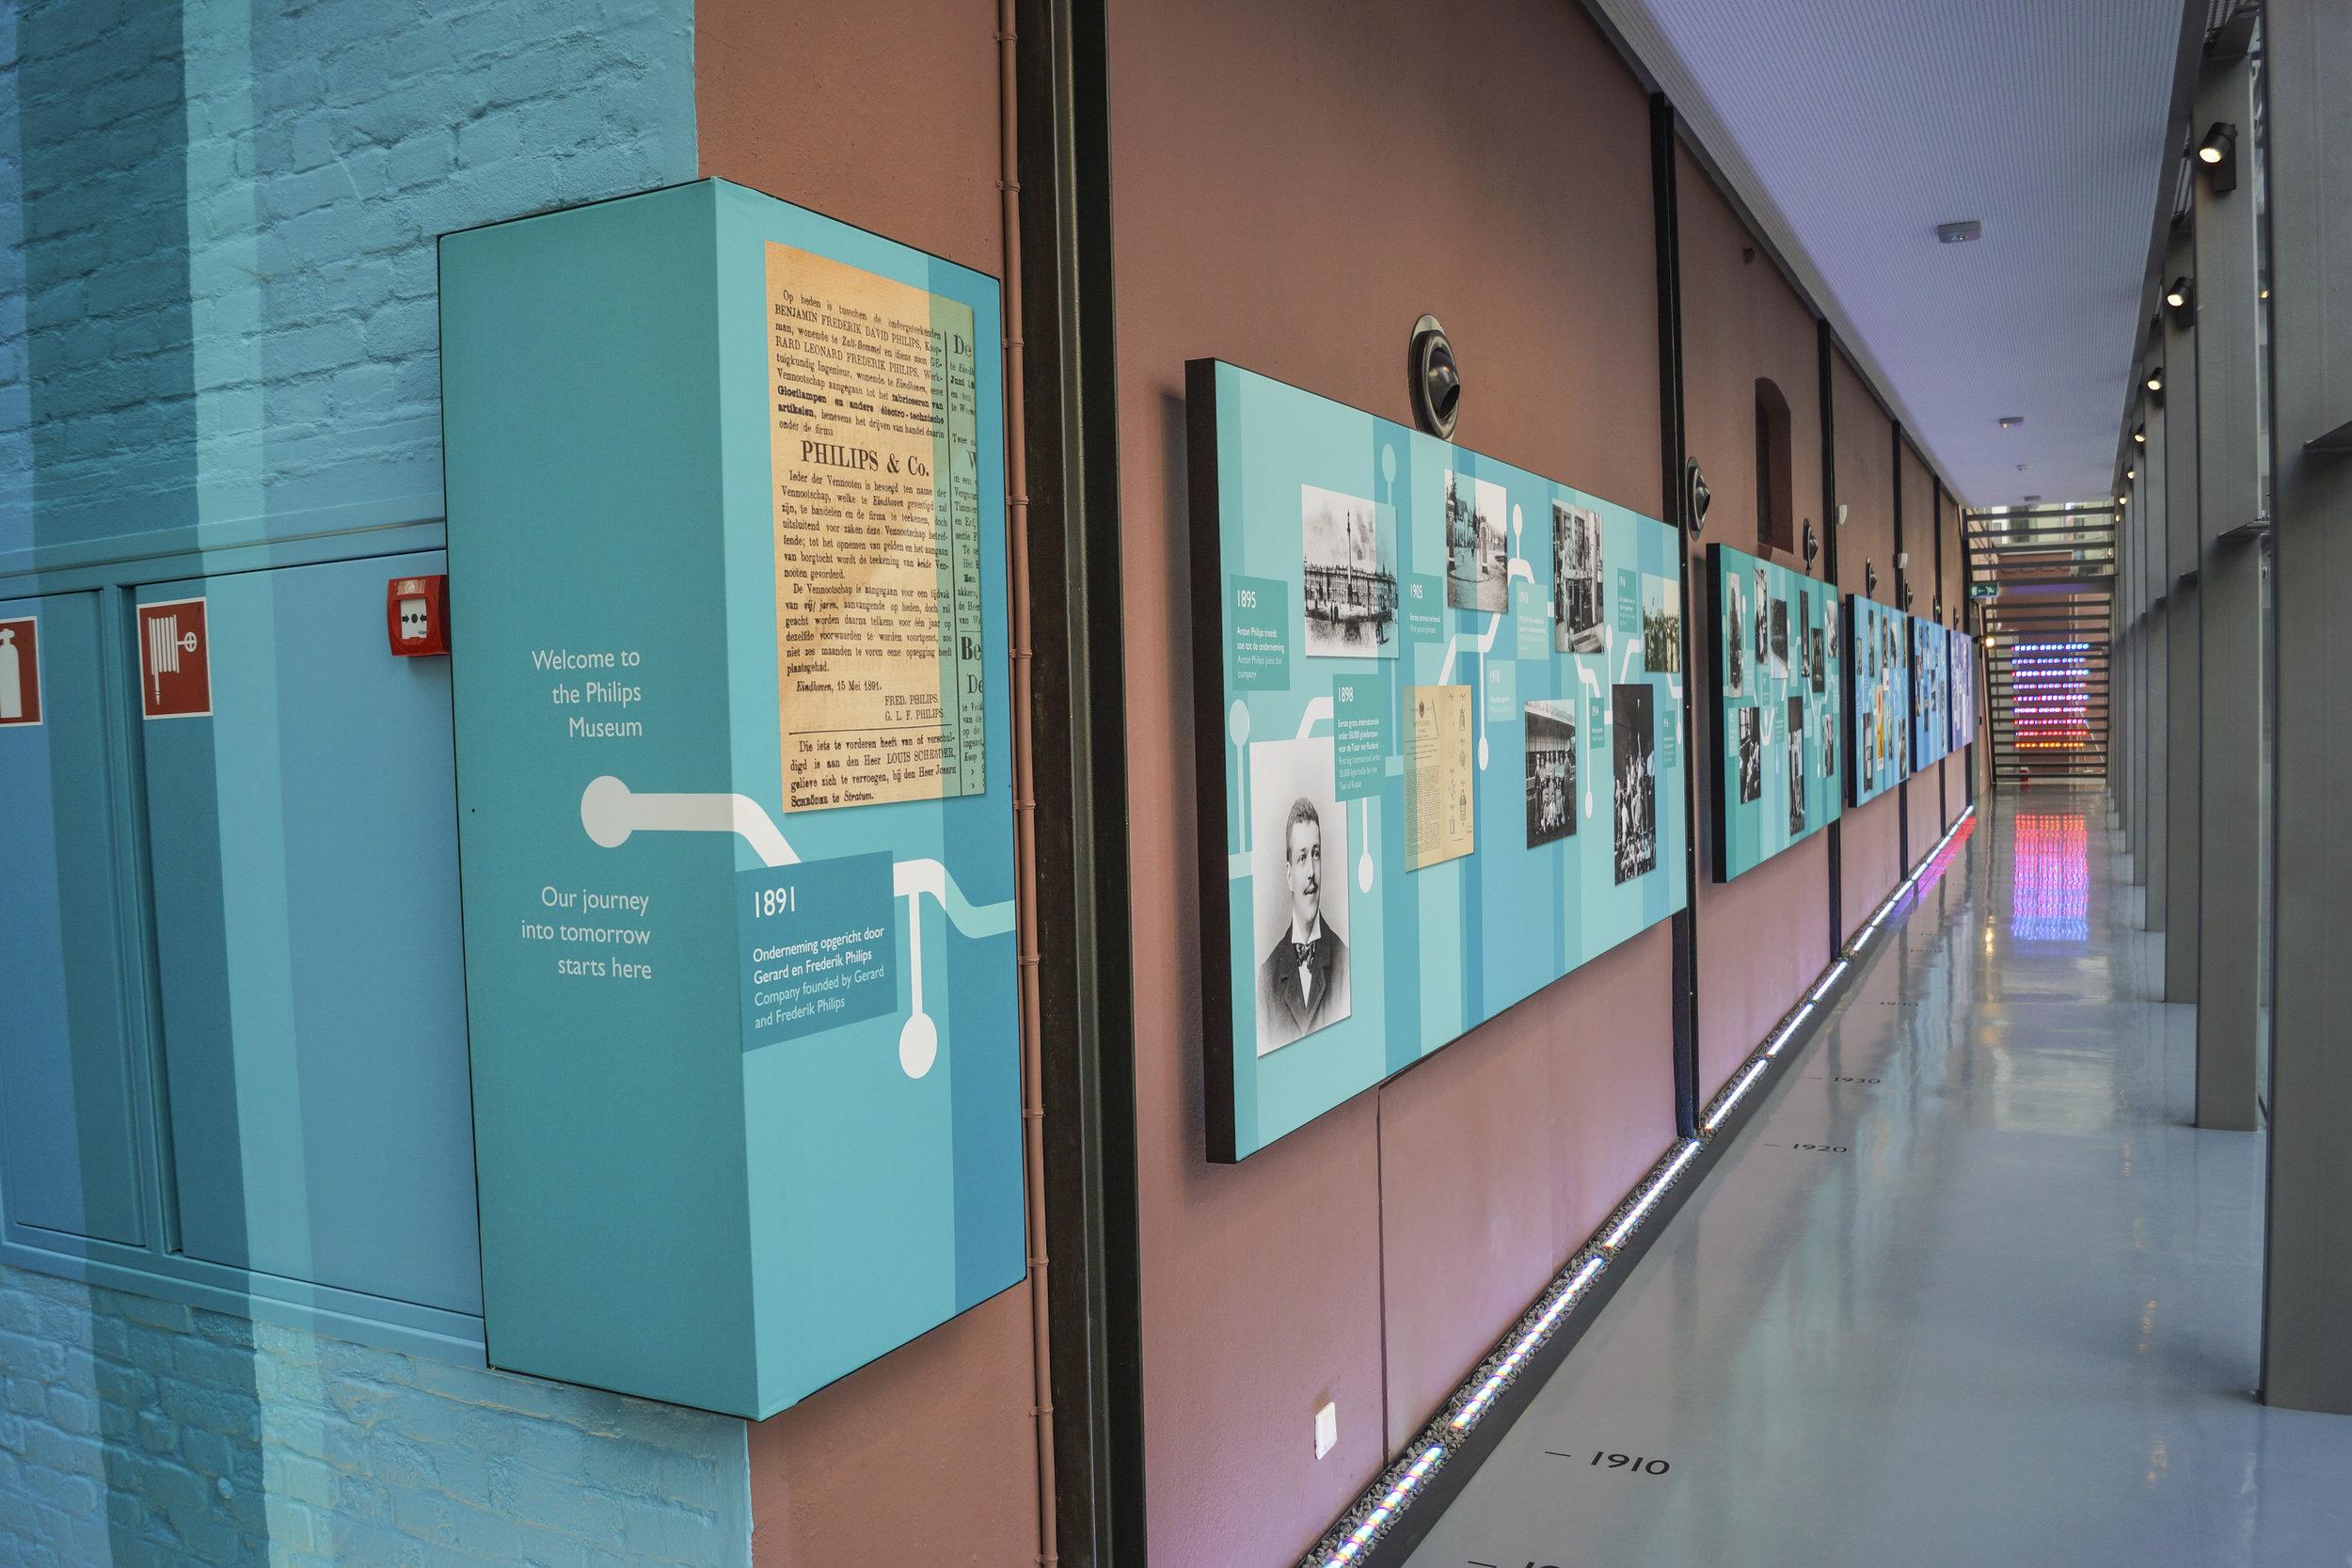 Interieur philips museum 1.jpg